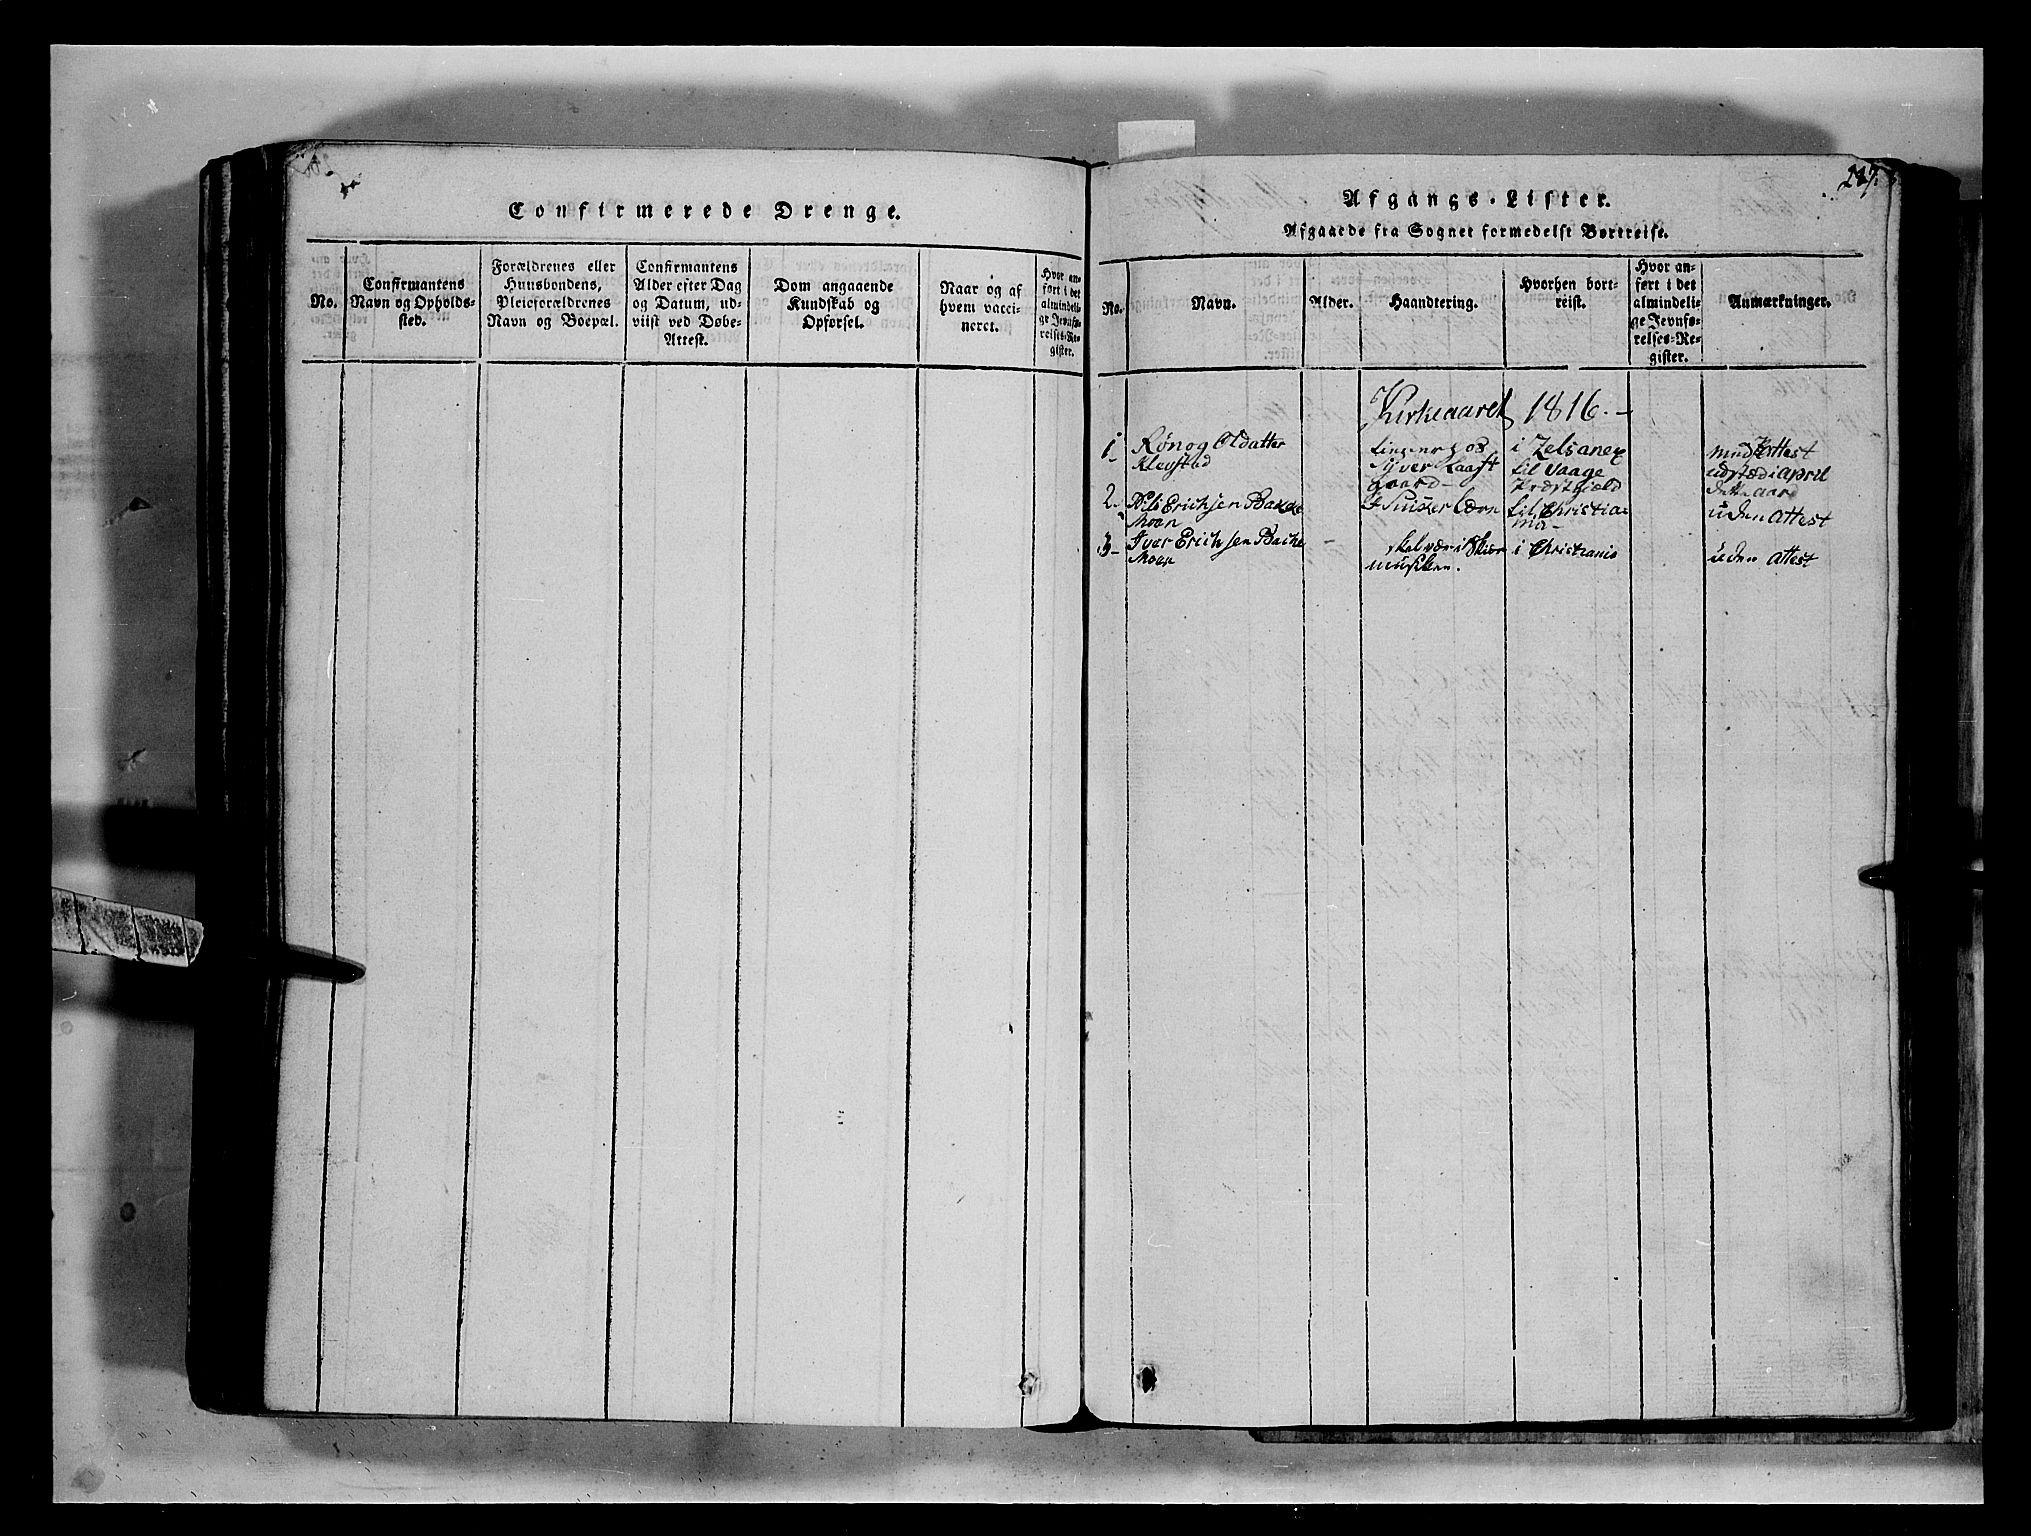 SAH, Fron prestekontor, H/Ha/Hab/L0002: Klokkerbok nr. 2, 1816-1850, s. 287